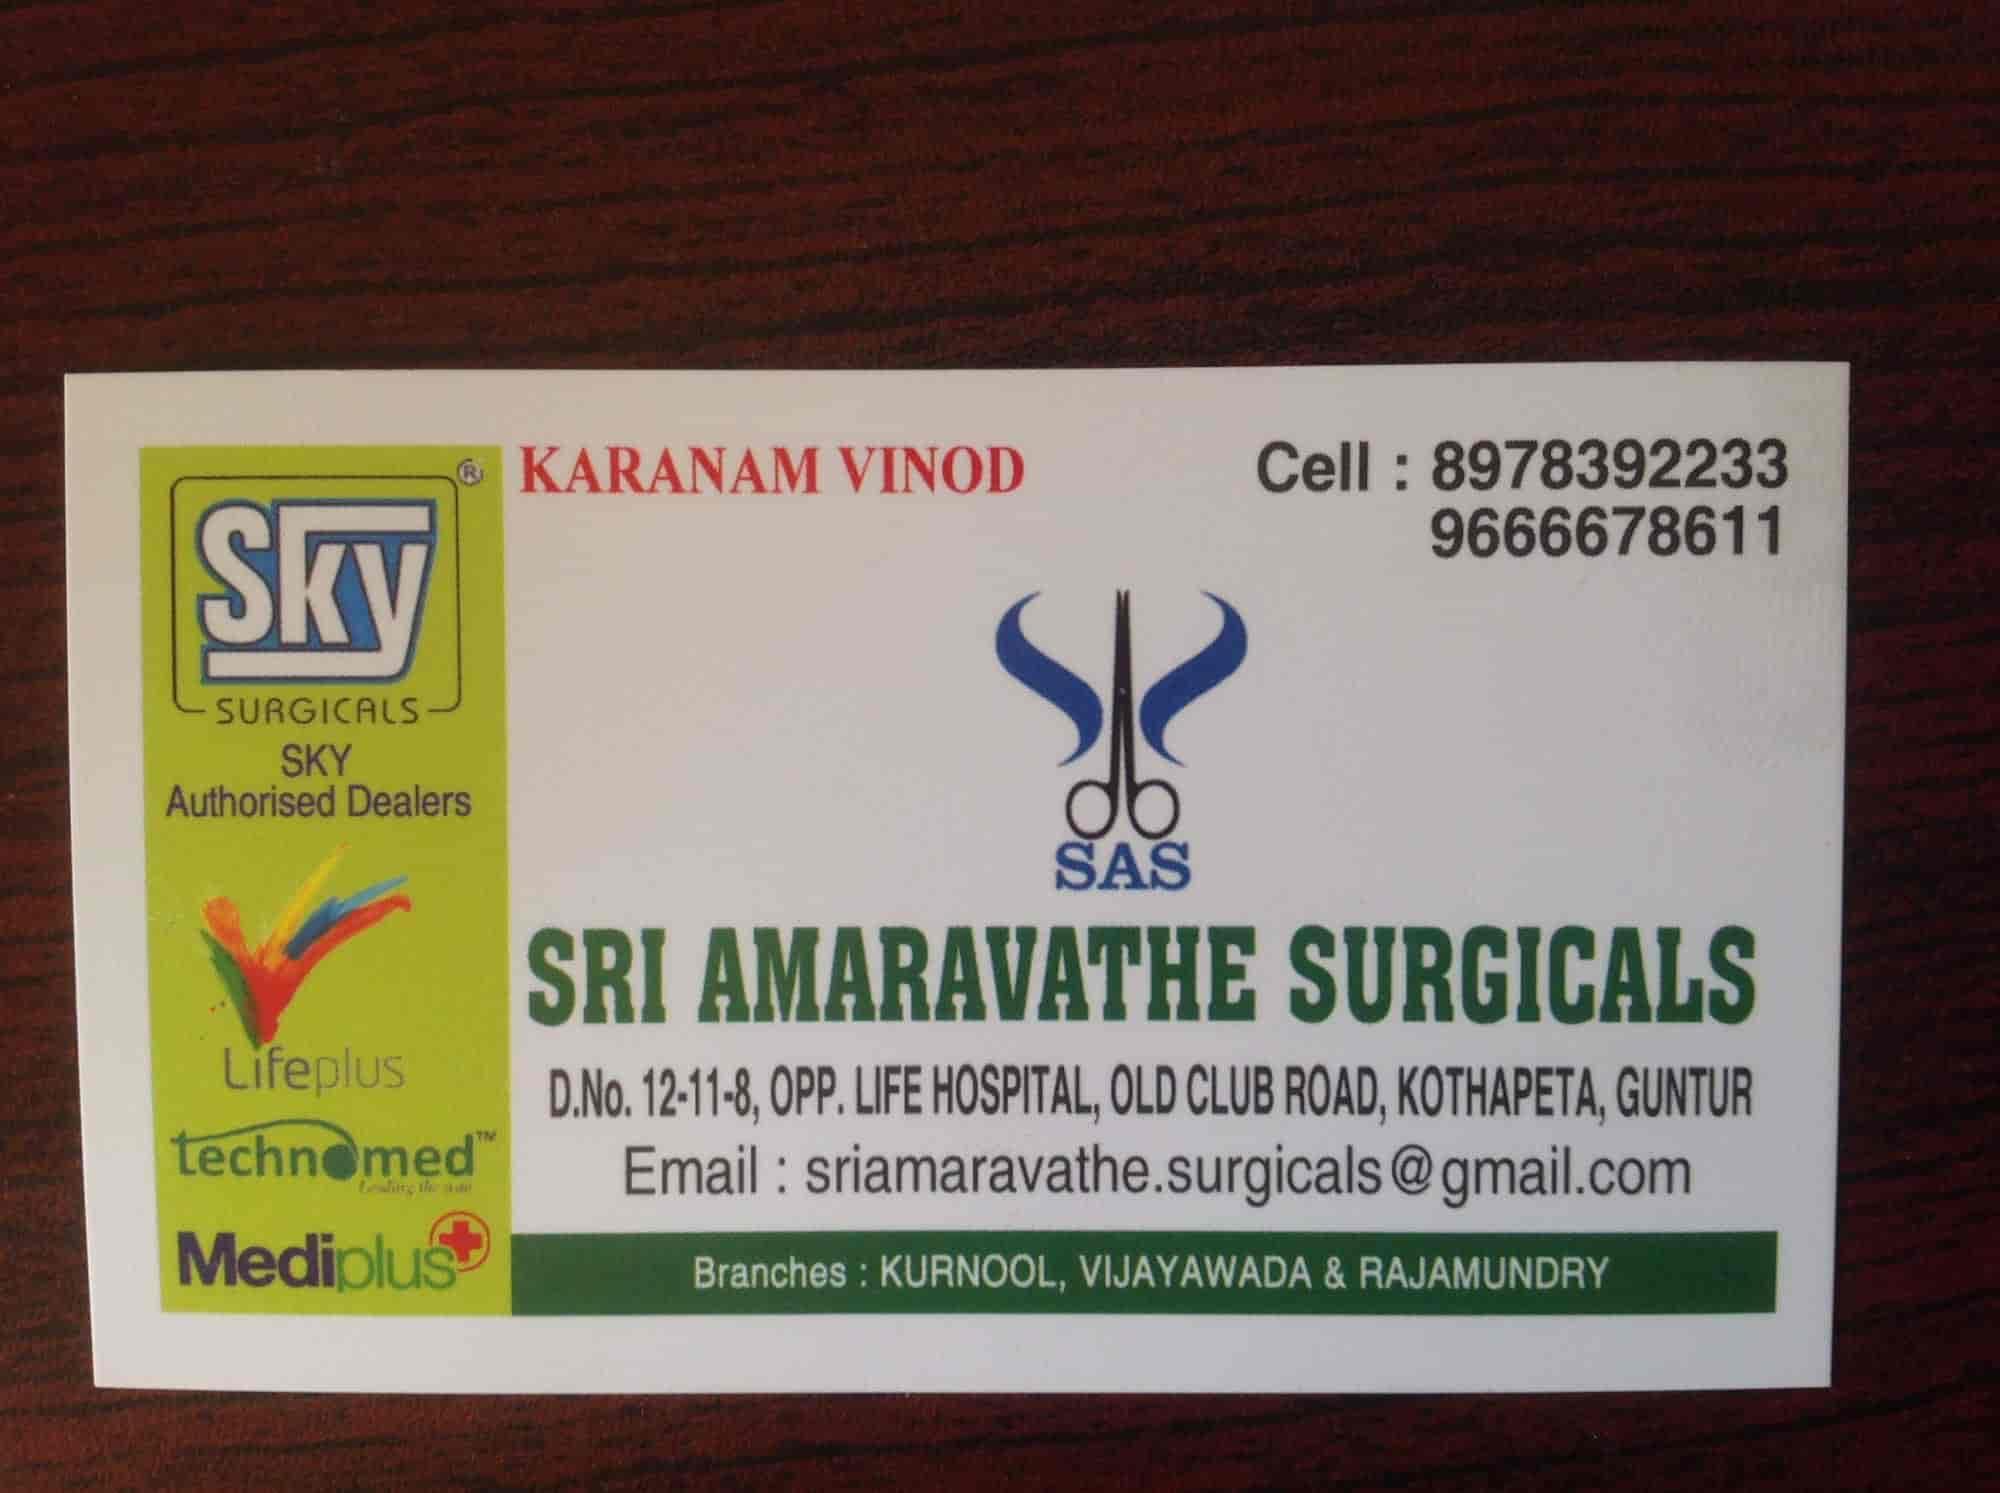 sri amaravathe surgicals kotha peta surgical equipment dealers in